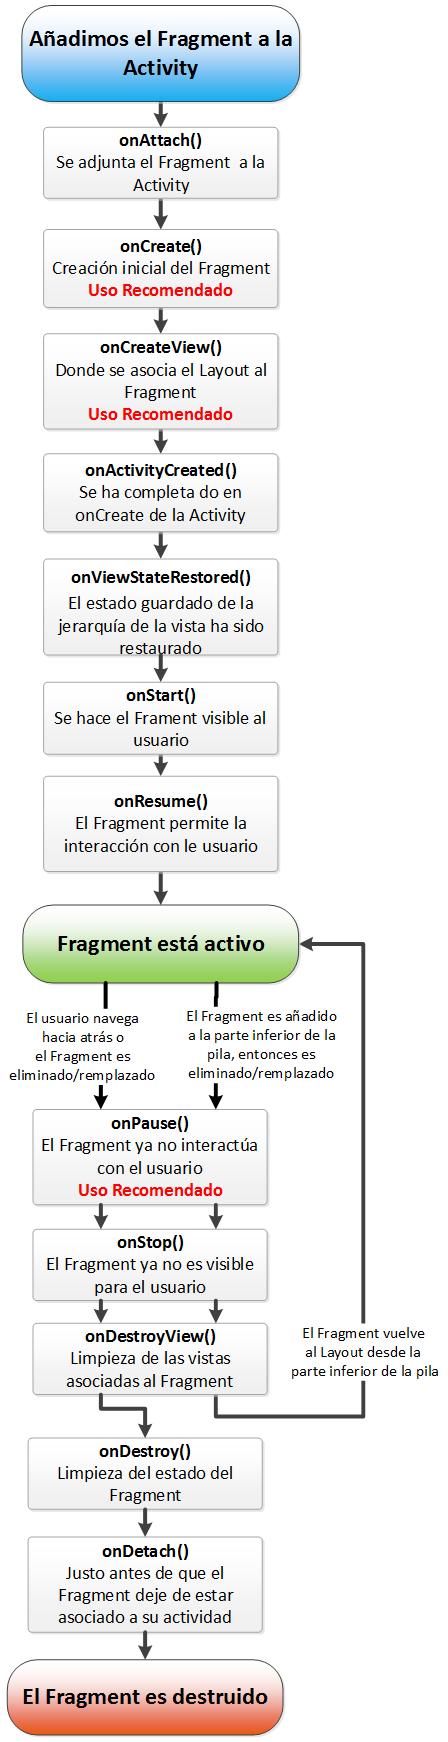 Ciclo de vida explicado de un fragmento o Fragment de Android - www.Jarroba.com